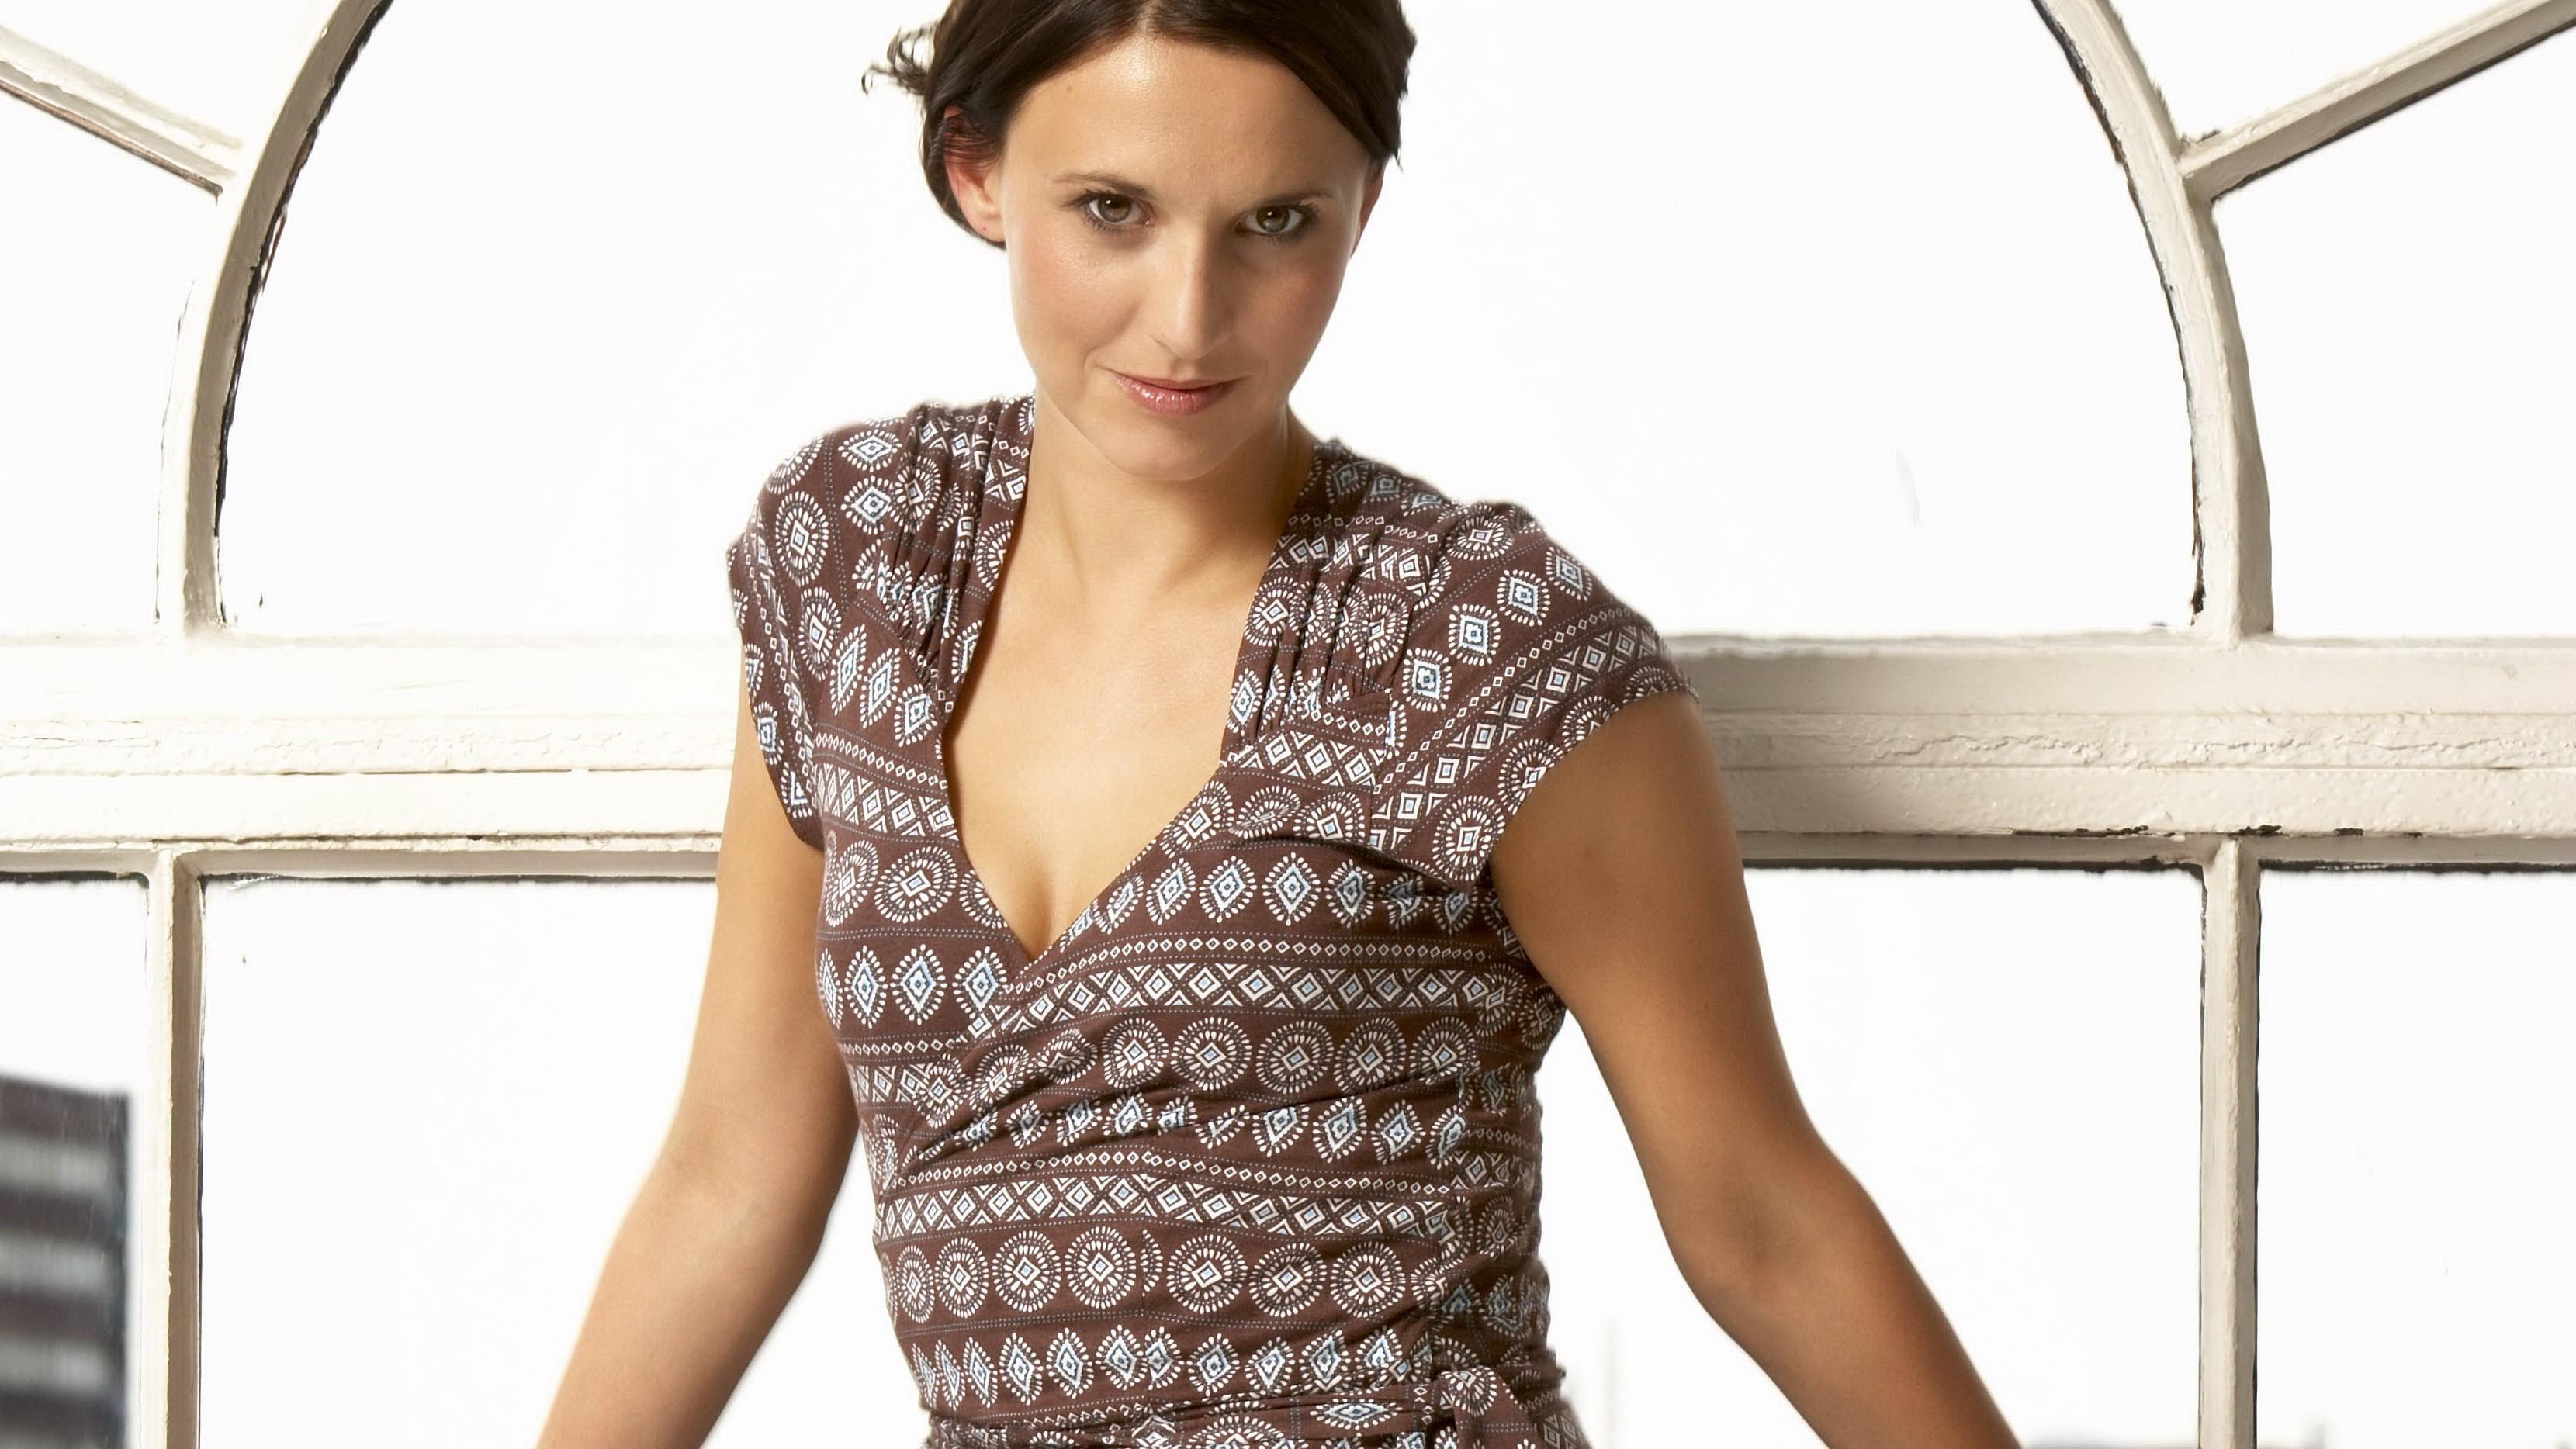 Hintergrundbilder : Modell-, lange Haare, Kleid, Muster, Mode ...